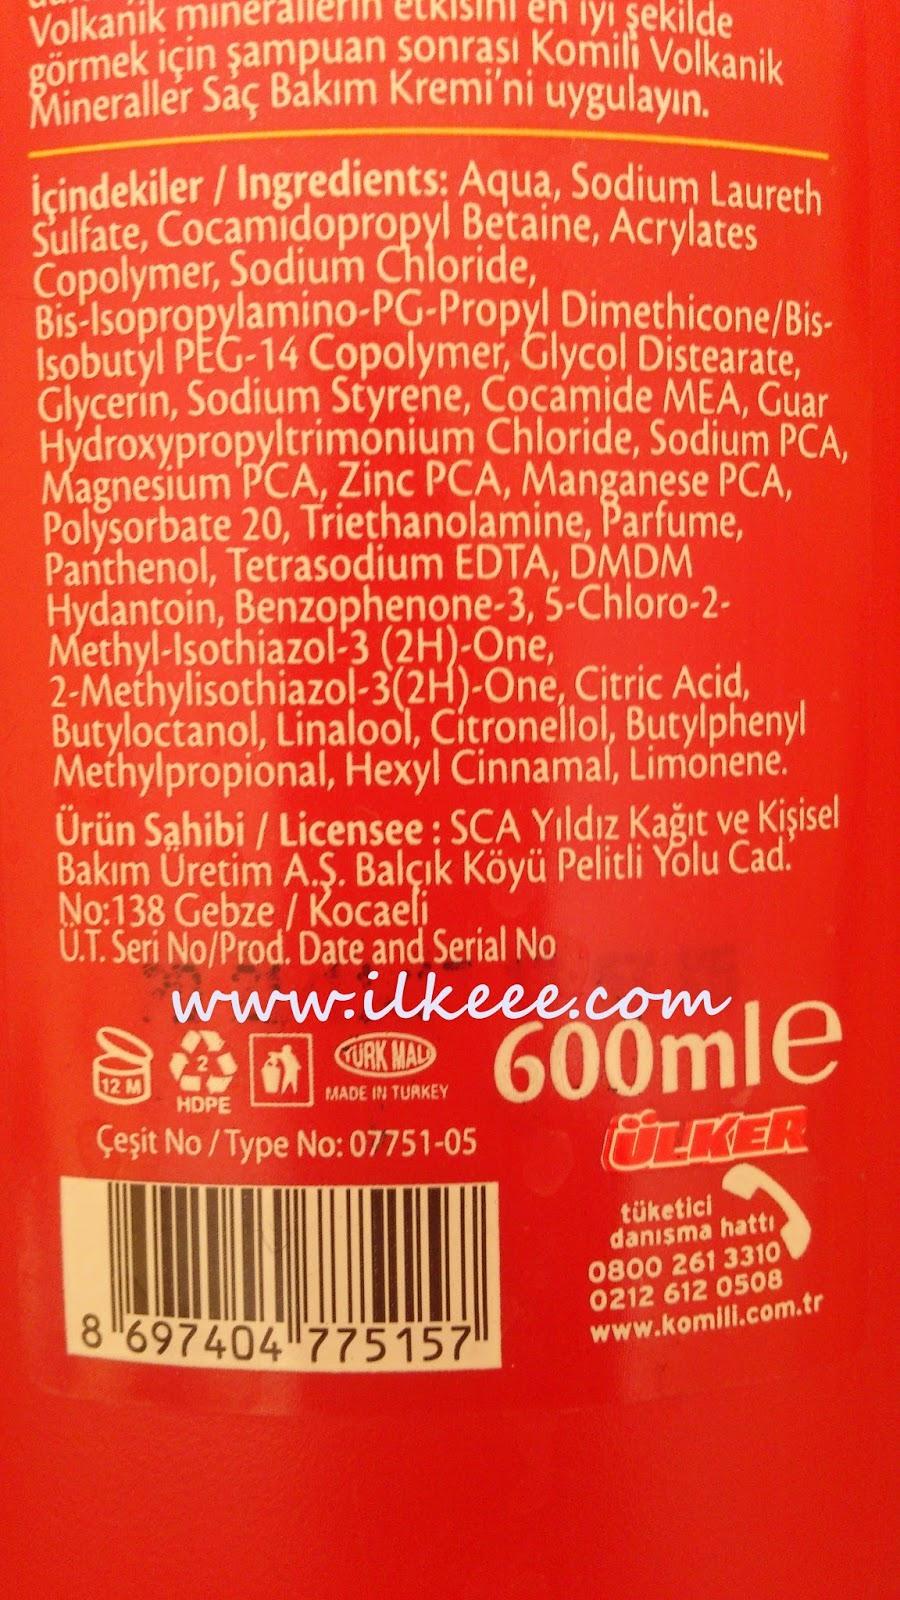 Komili Volkanik Mineraller Şampuanı- Komili-Besleyici Bakım-Parabensiz Şampuan